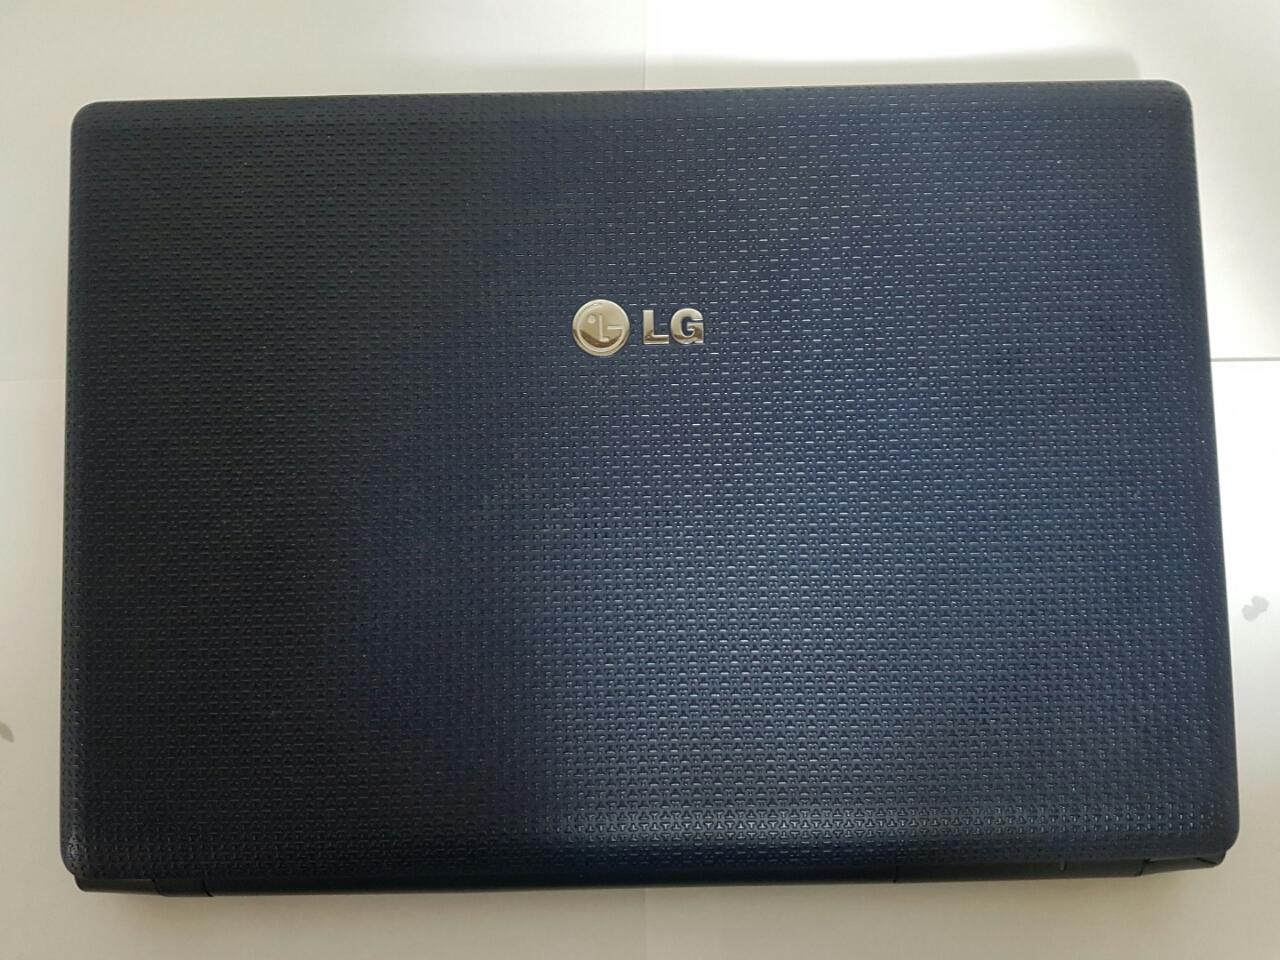 LG노트북  후지모리쯔 노트북